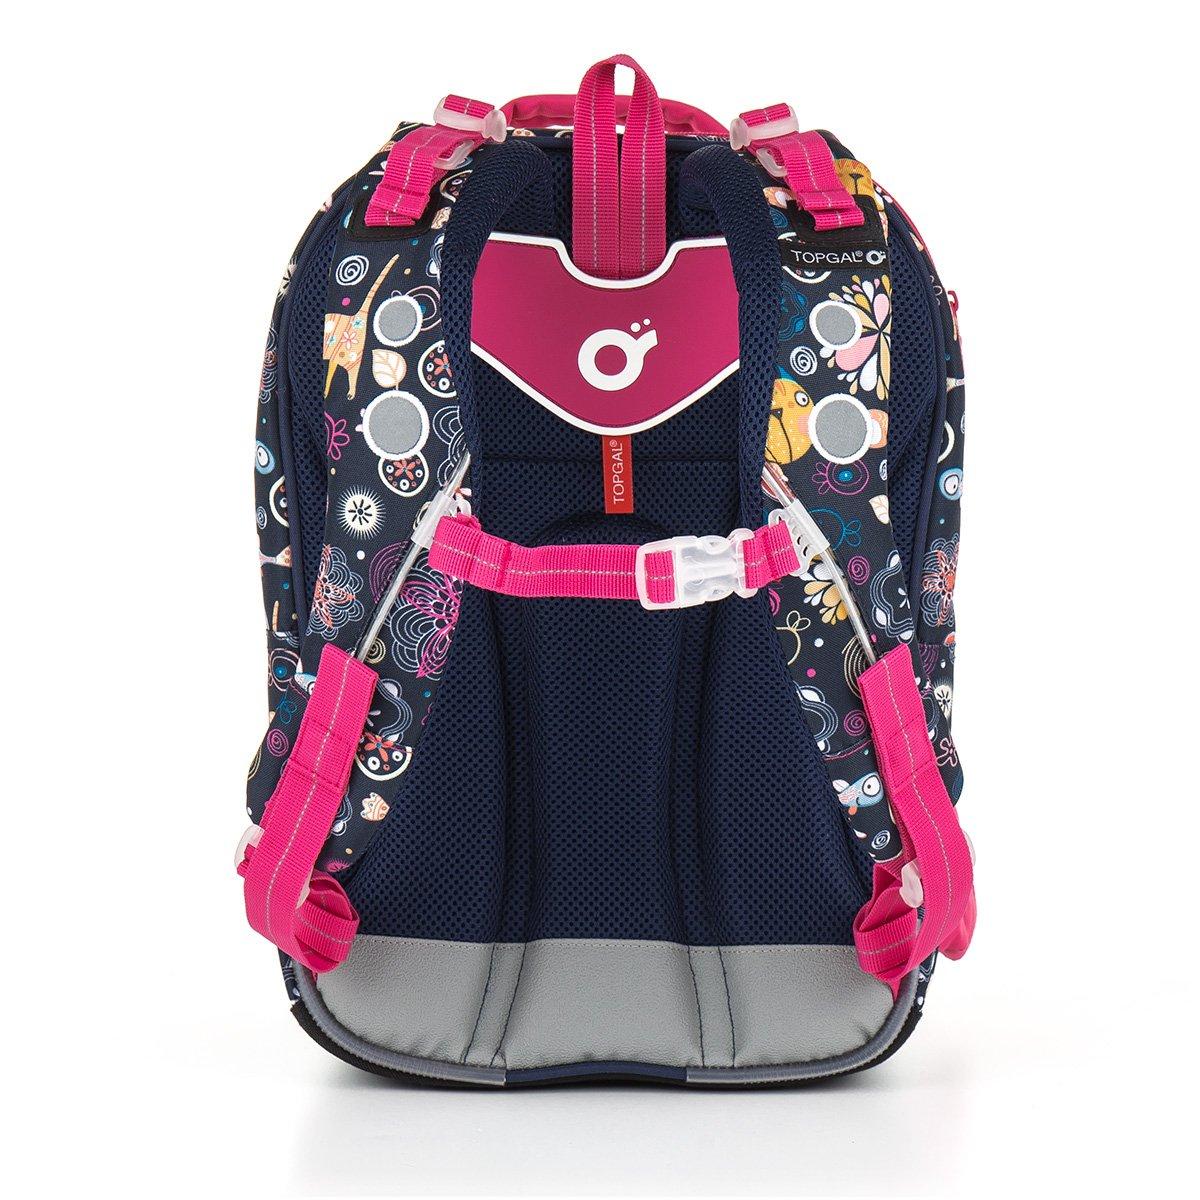 81262385e41 Školní batoh Topgal CHI 876 D - Blue